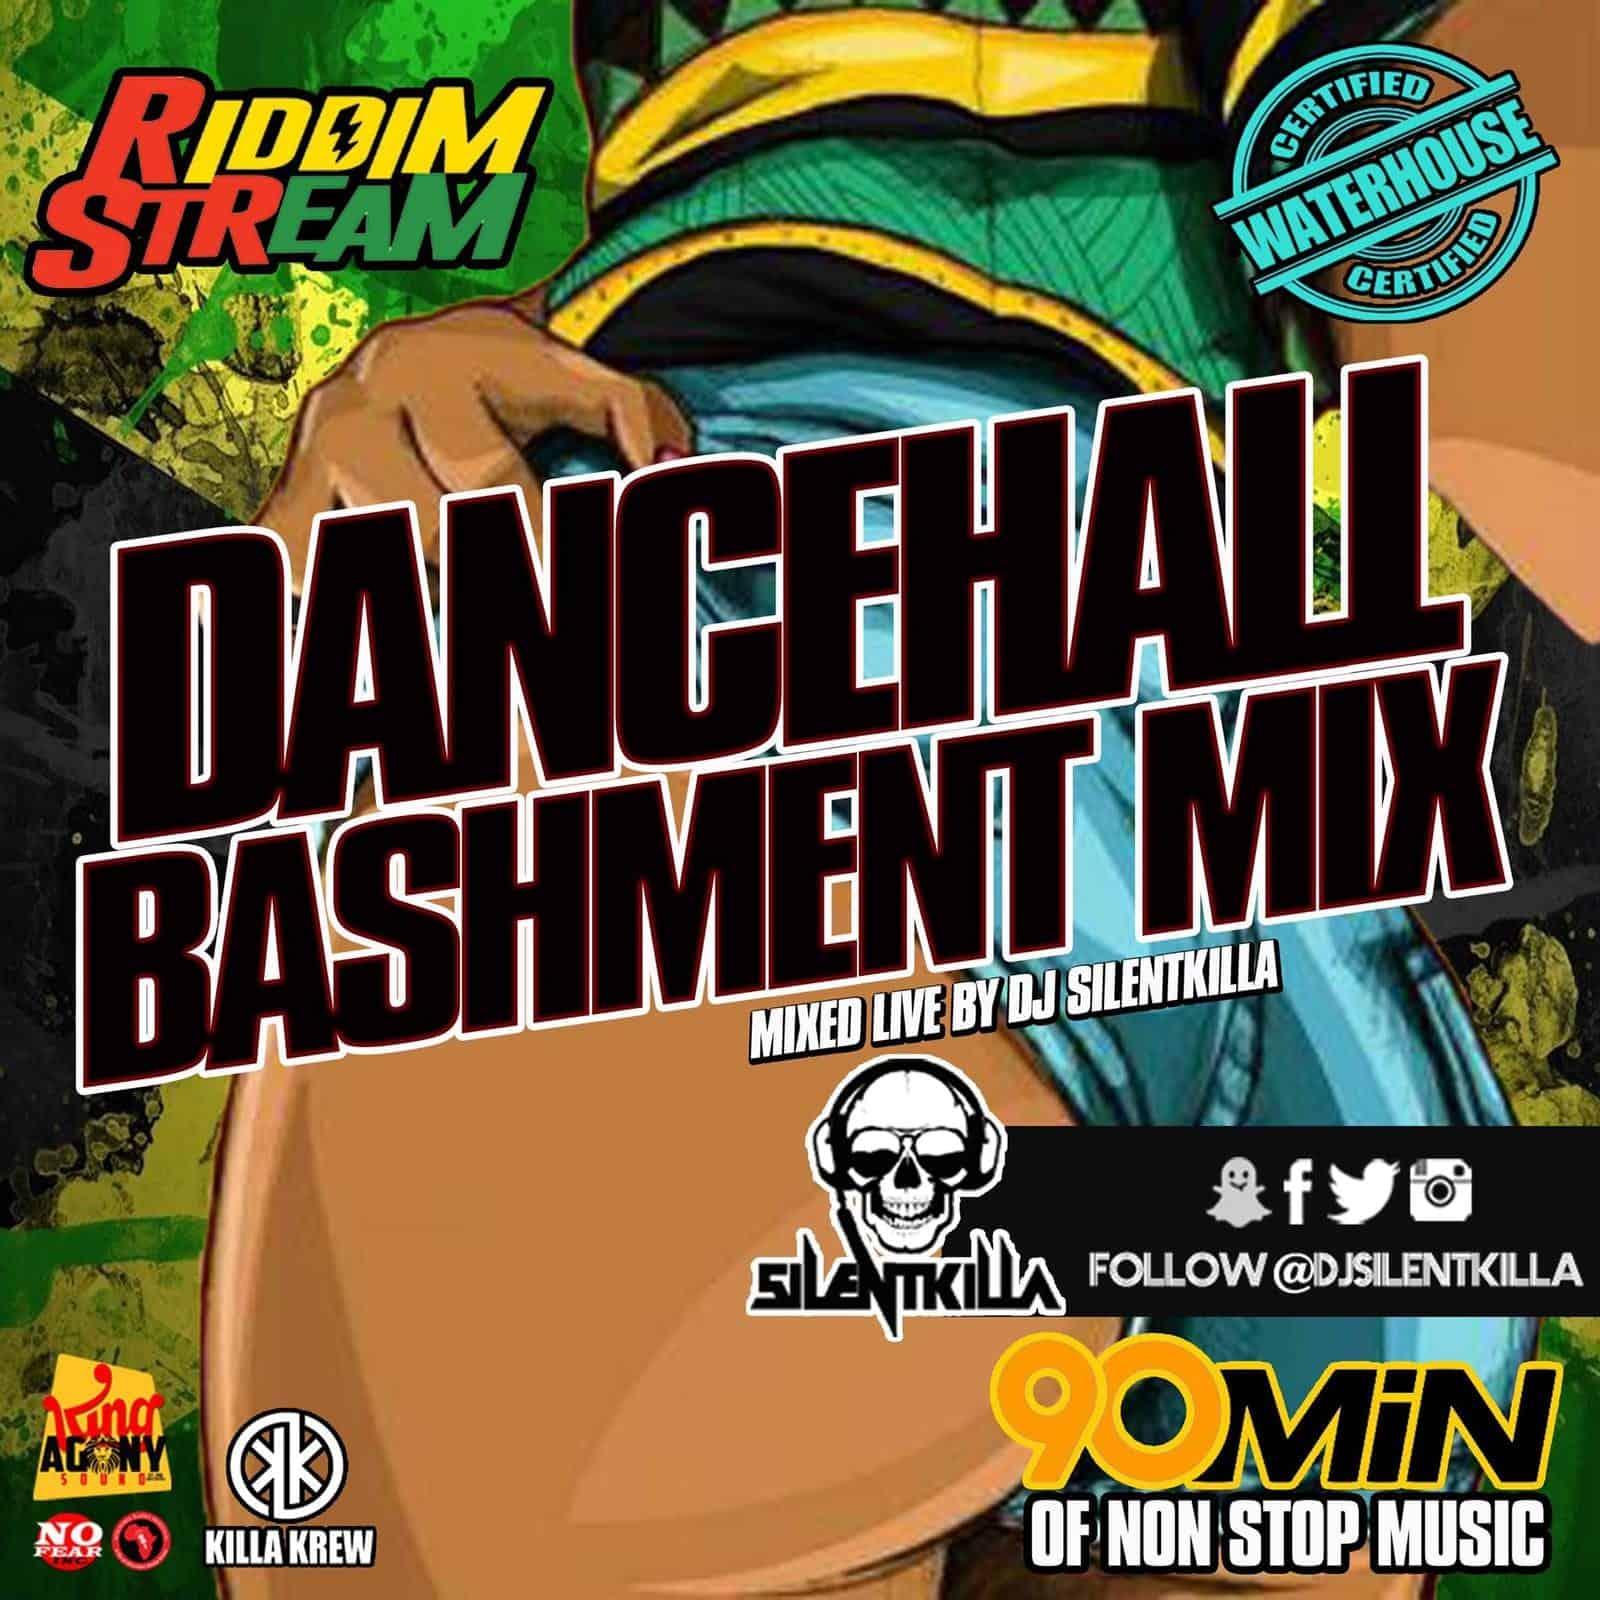 DJ Silentkilla - Dancehall Bashment Mix - Waterhouse Certified